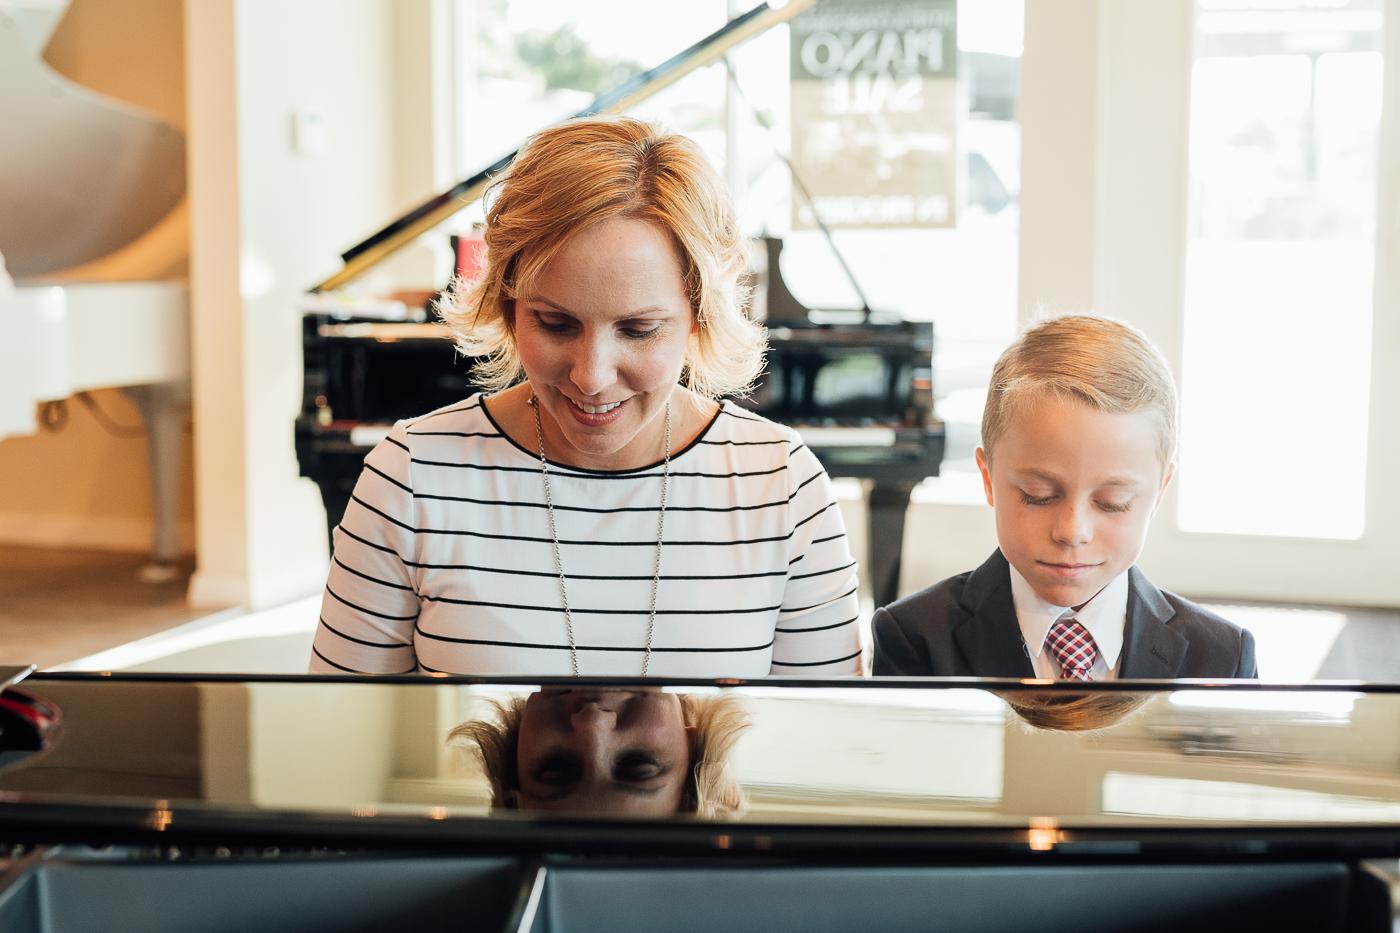 Piano Recital Resized for Web-69